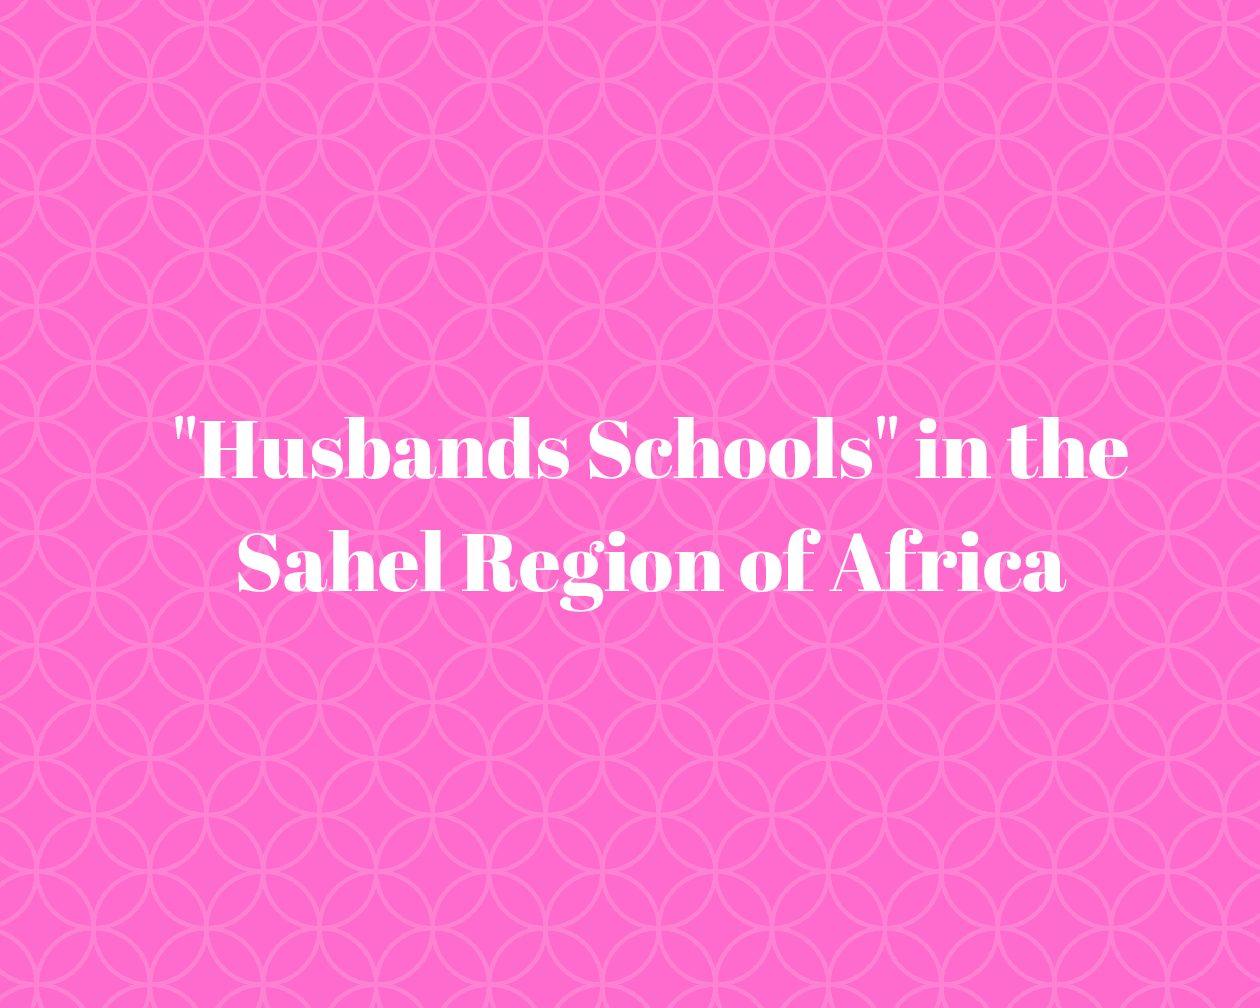 """Husbands Schools"" in the Sahel Region of Africa"